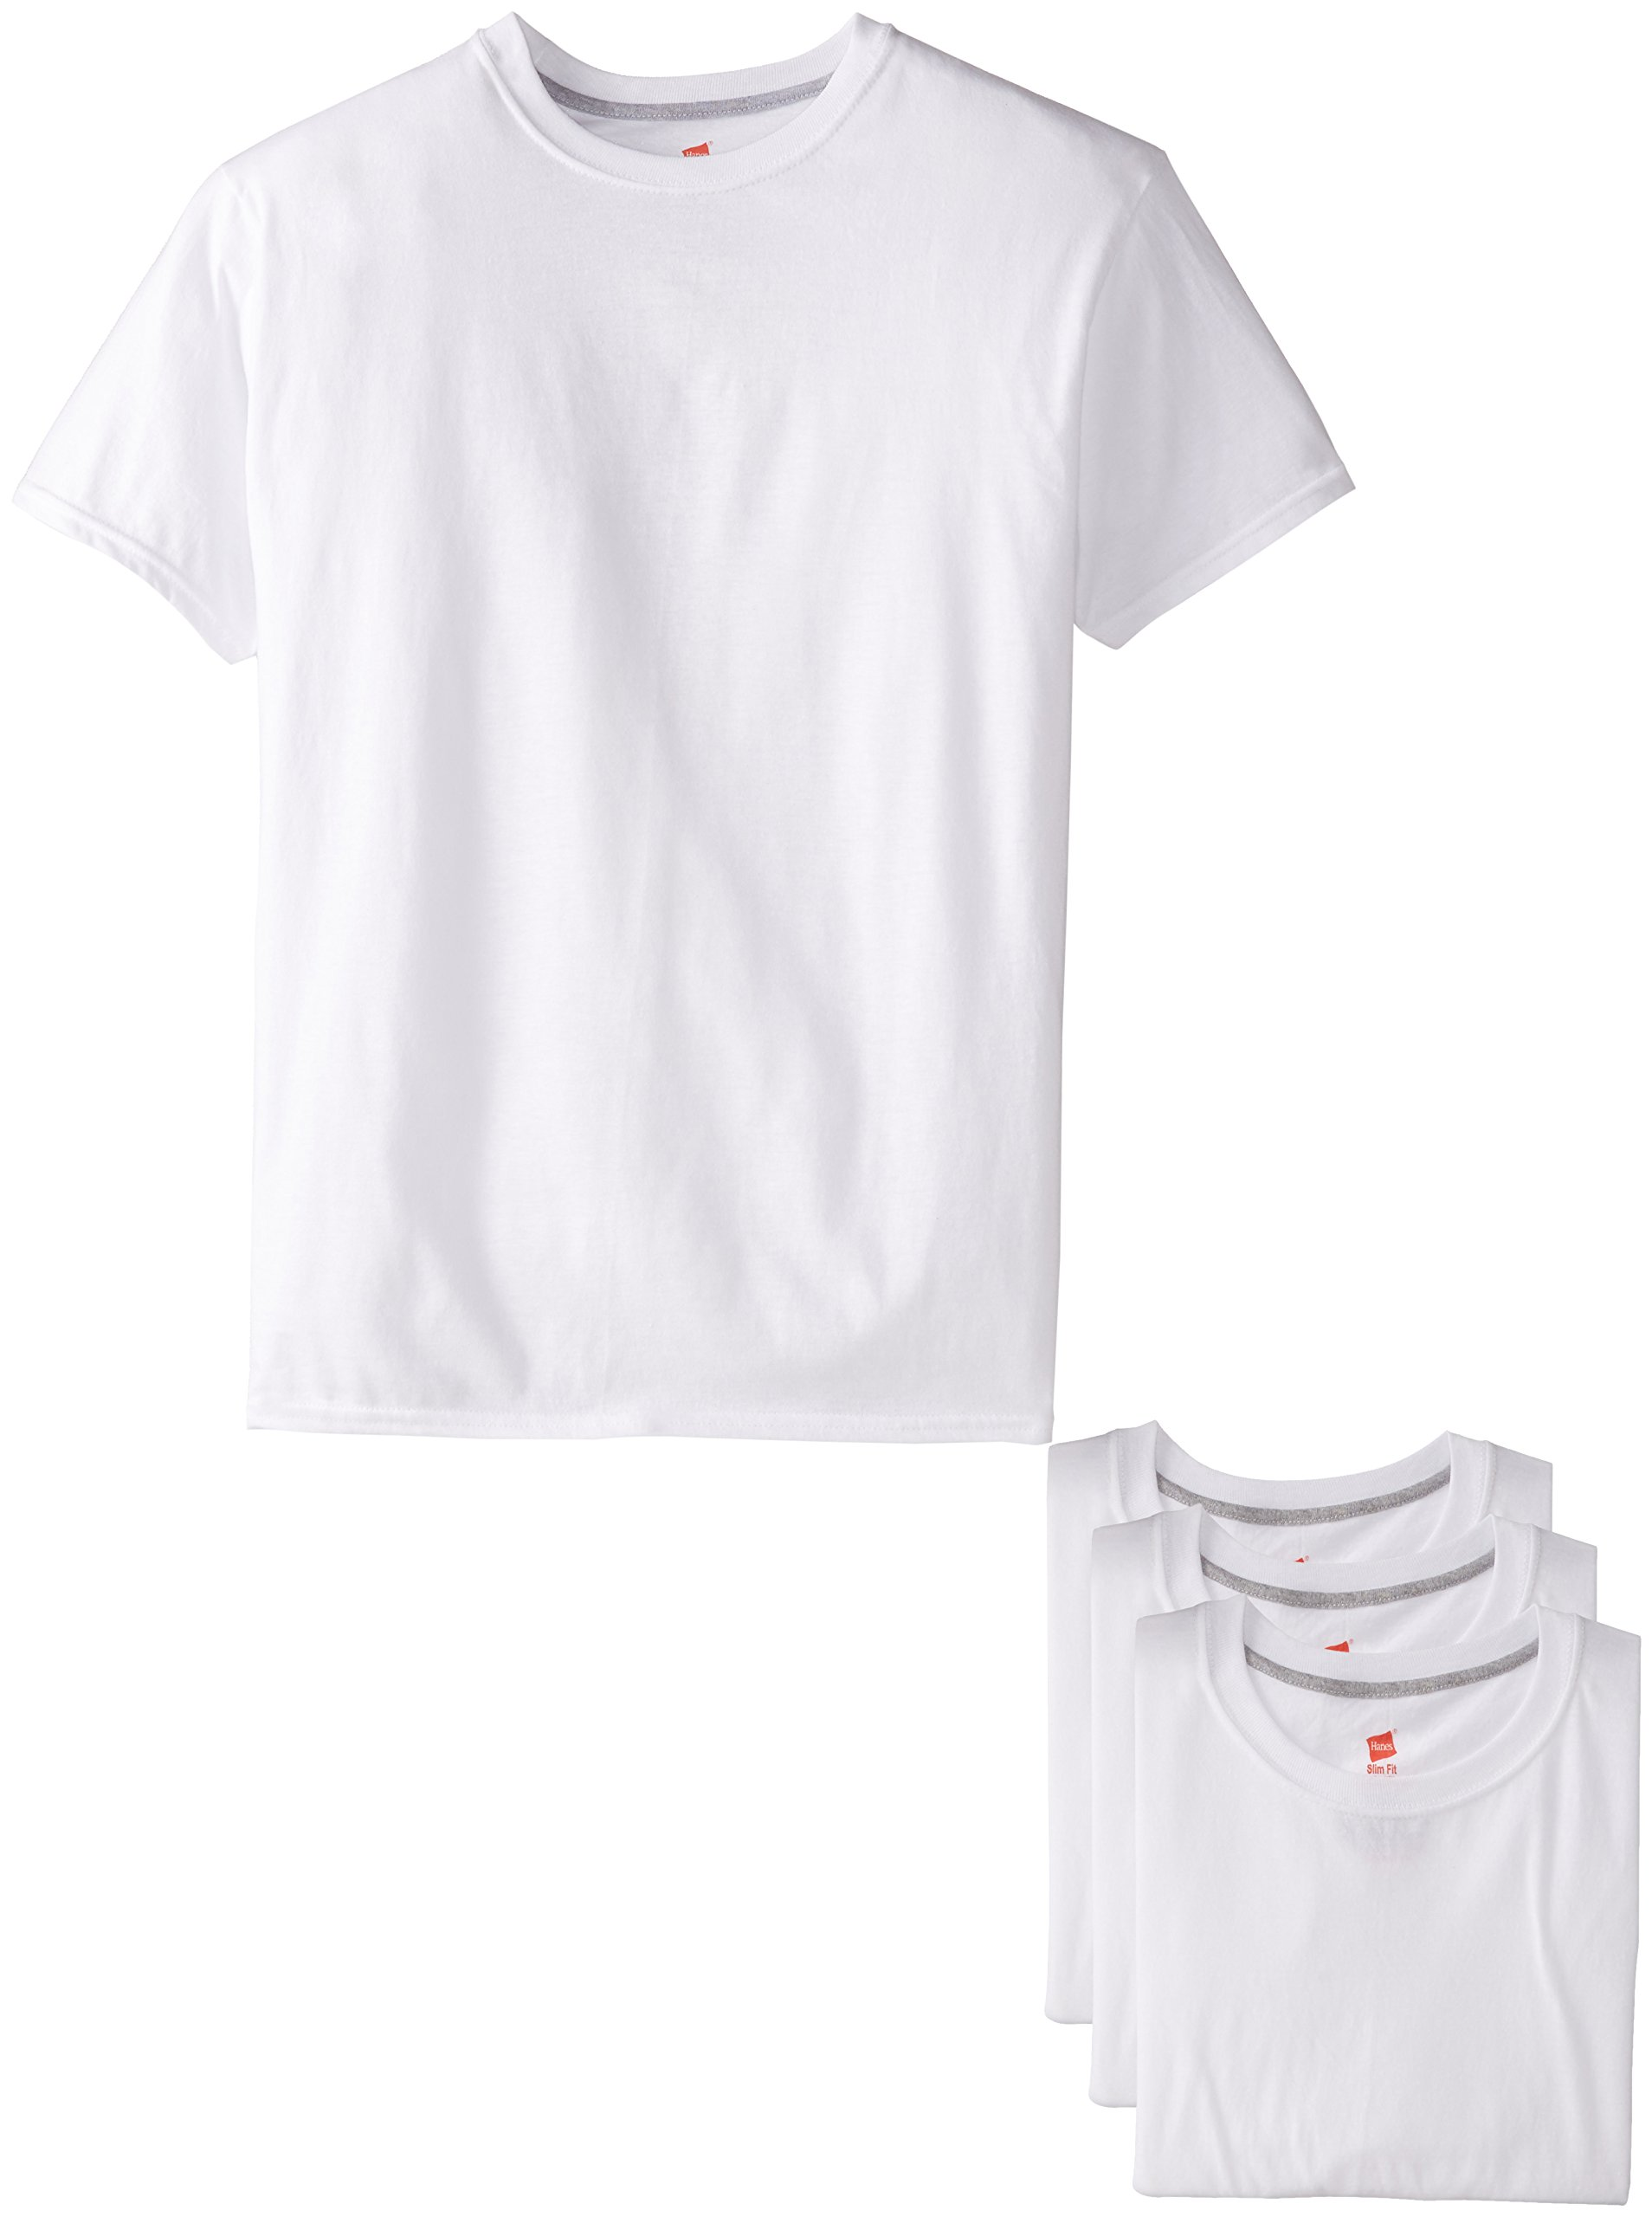 Hanes Ultimate Men's 4-Pack FreshIQ White Slim Fit Crew T-Shirt,White,Large